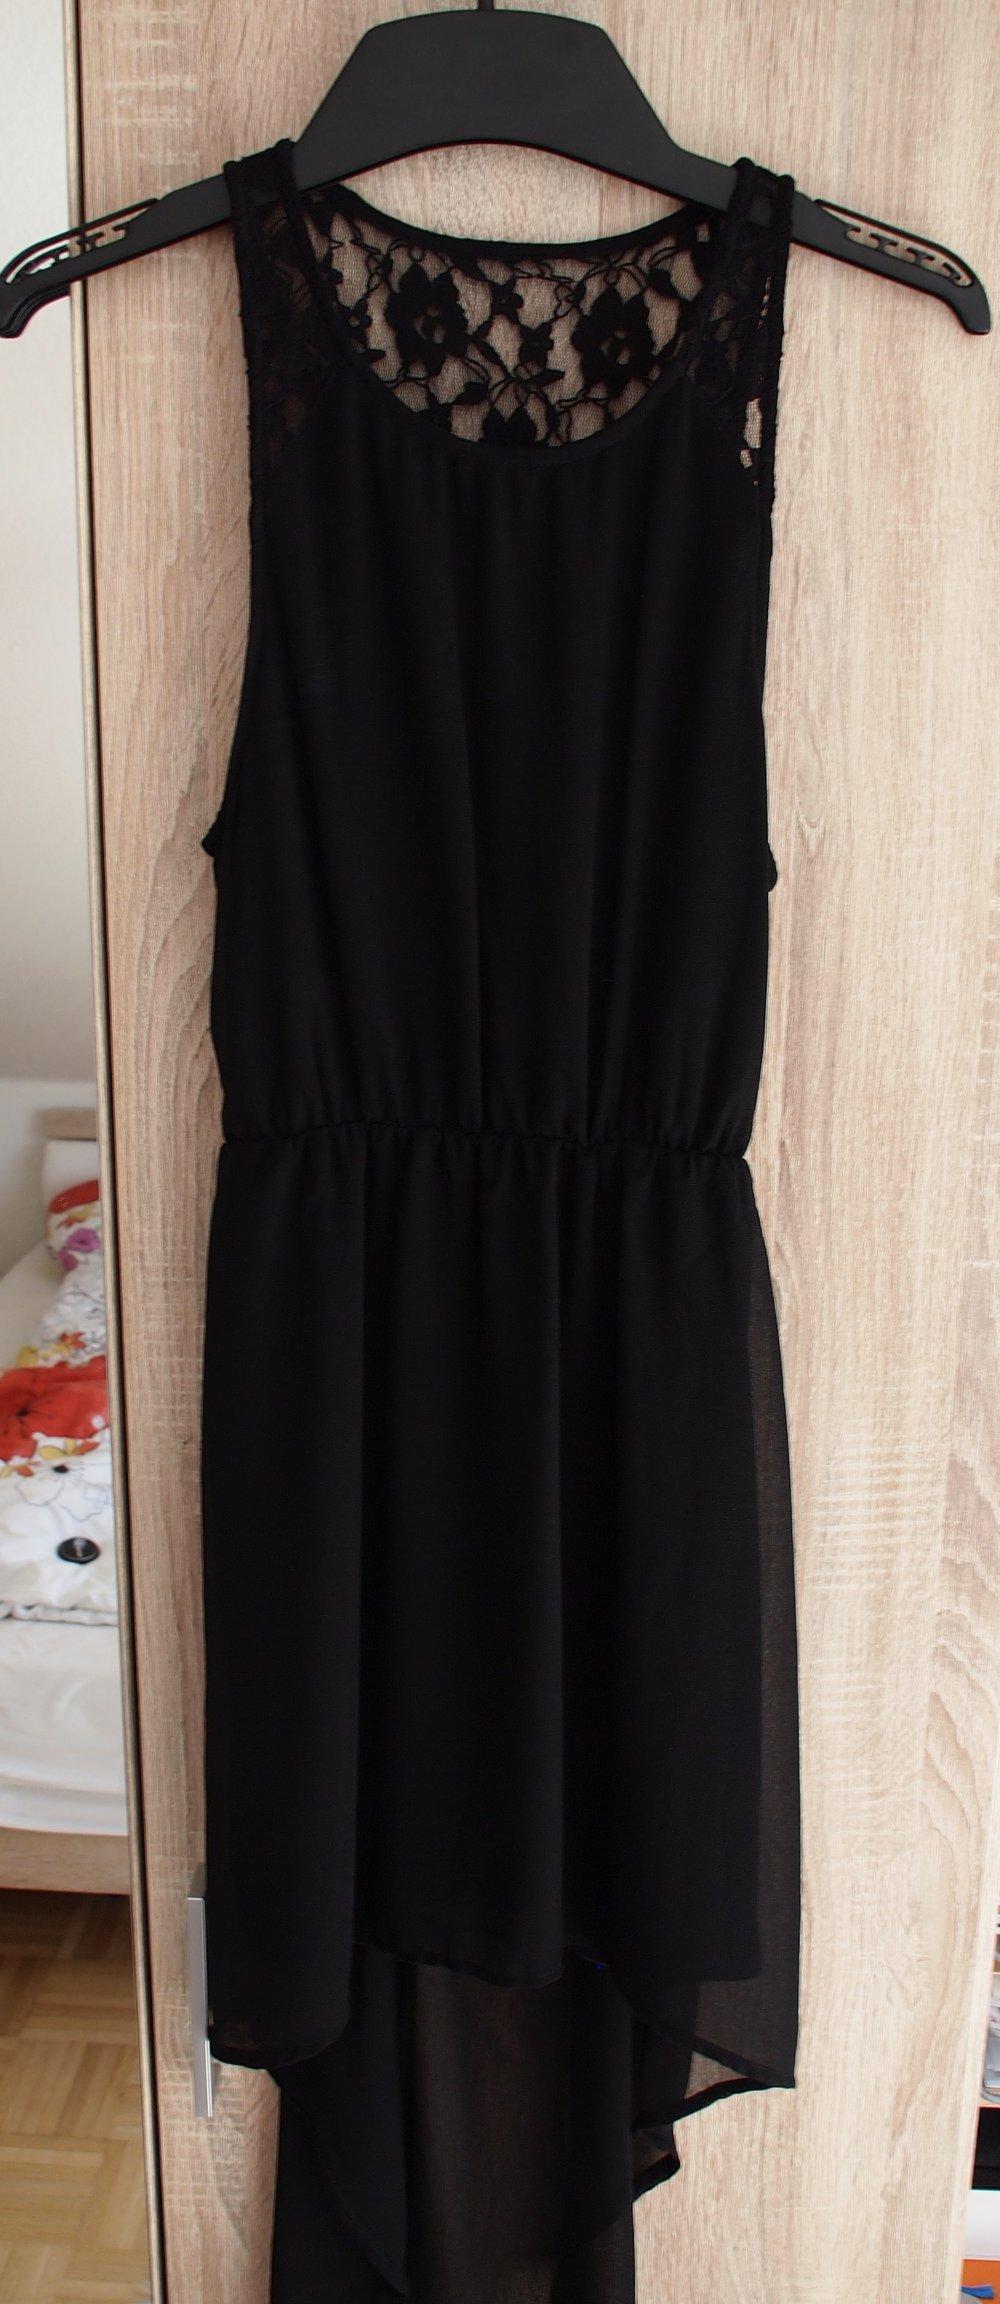 h&m abendkleid kleid schwarz spitze chiffon vokuhila s 38